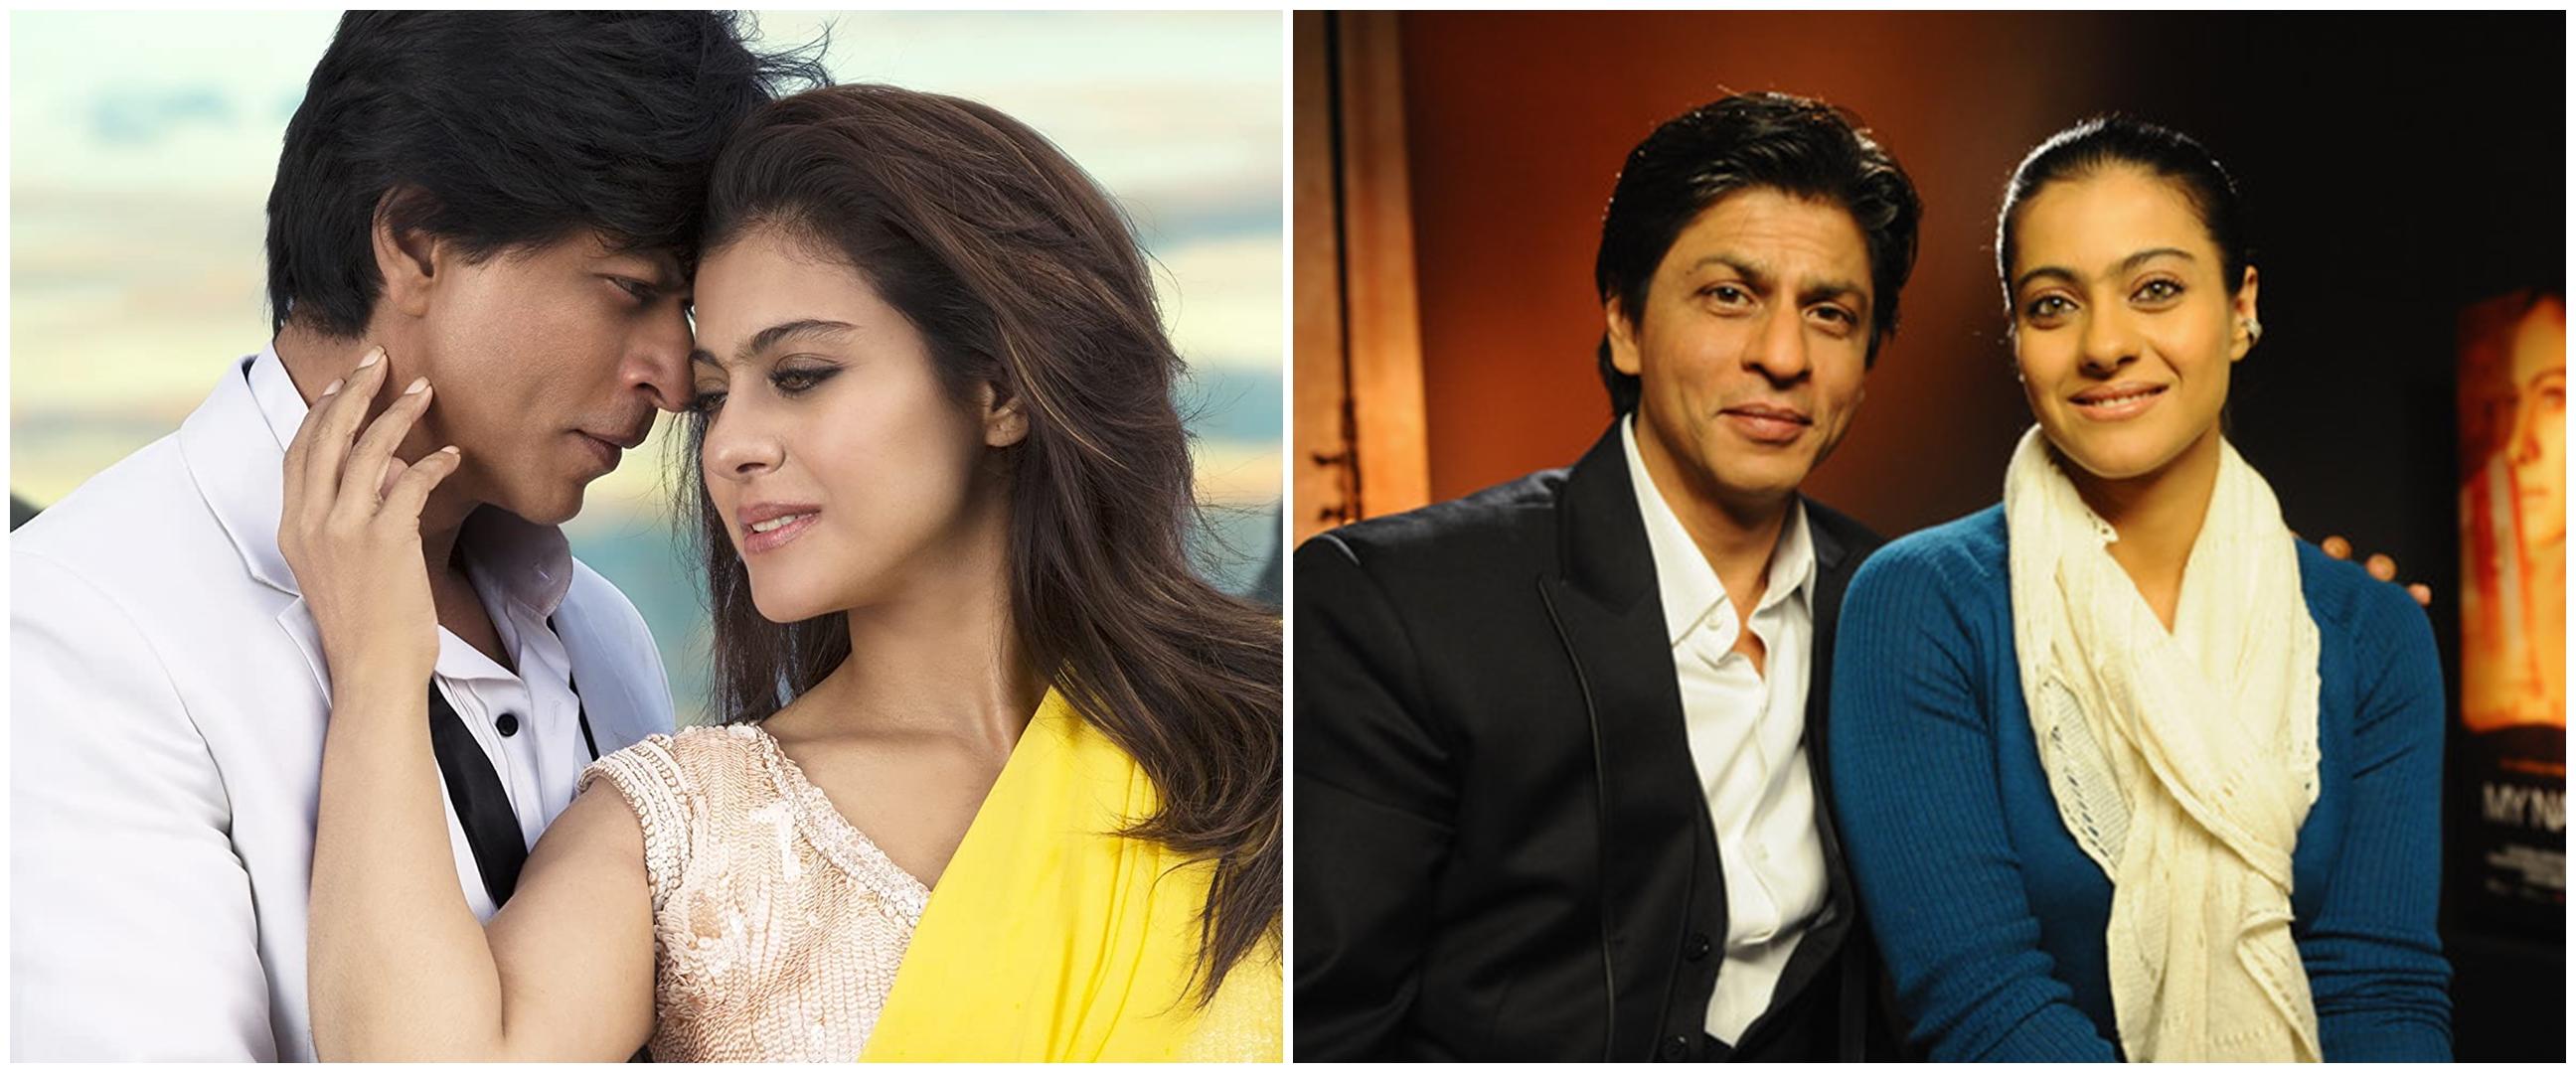 Shahrukh Khan sebut 2 artis cilik ini cocok gantikan dirinya dan Kajol